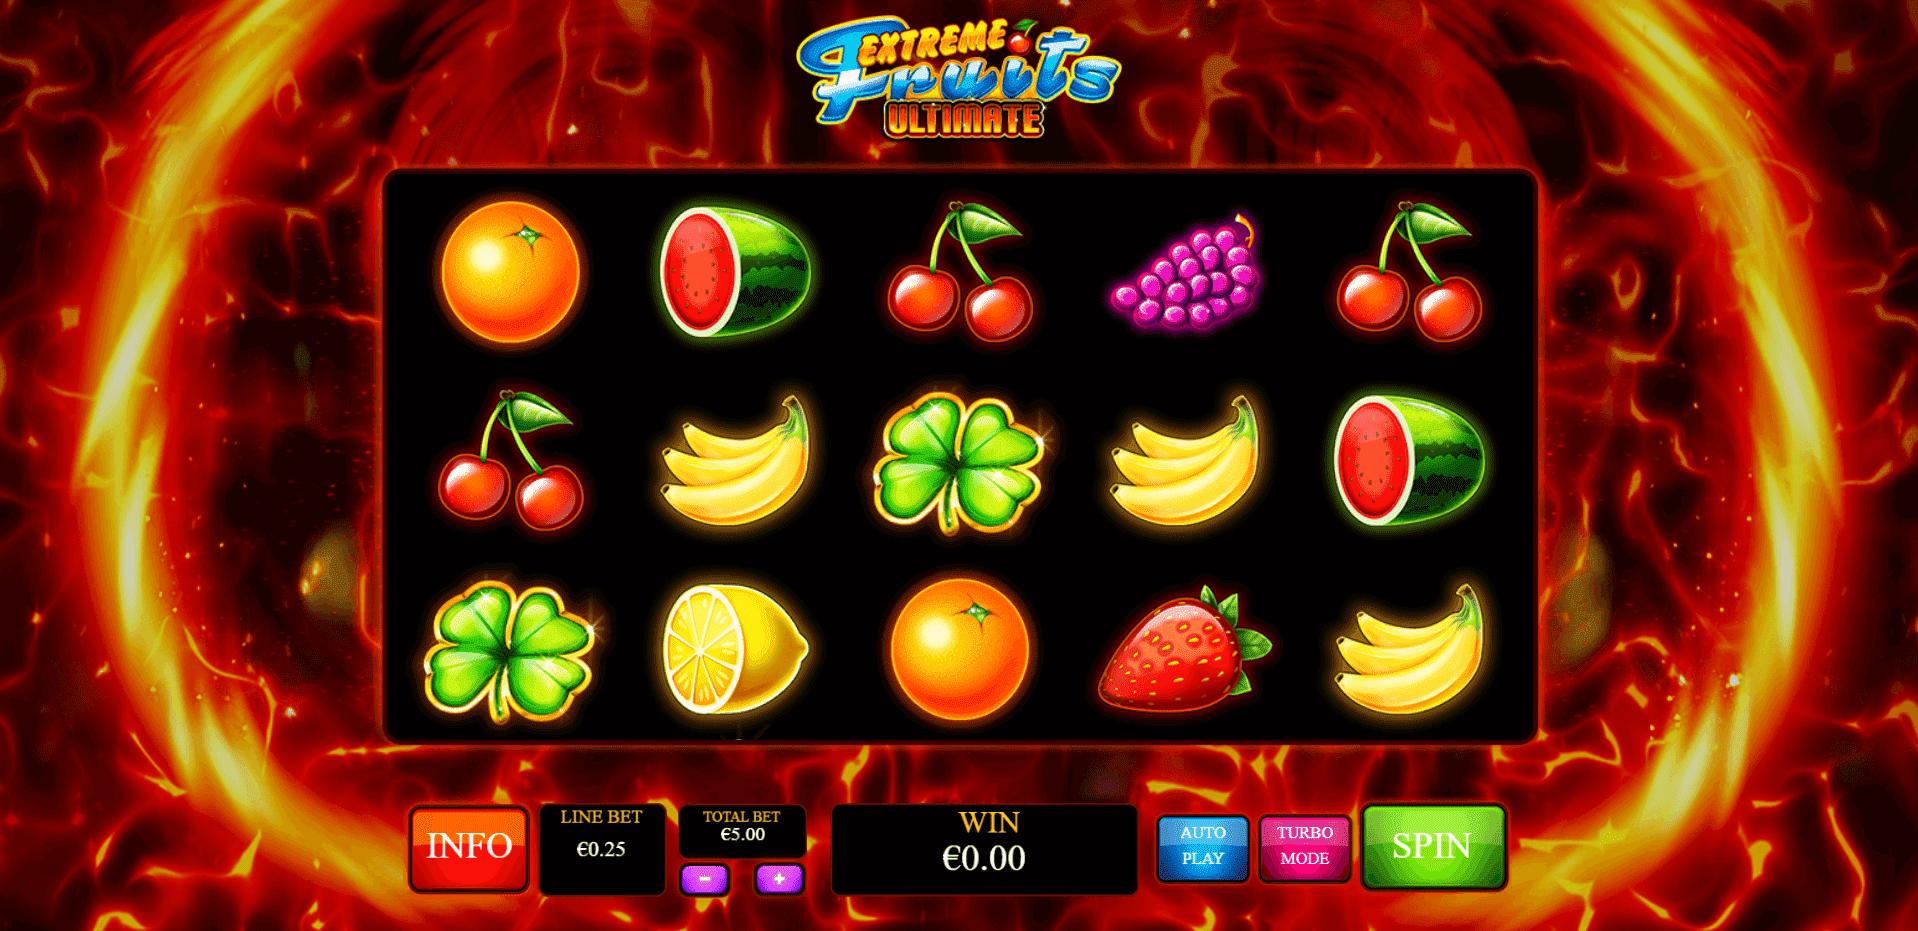 Extreme Fruits Ultimate slot machine screenshot